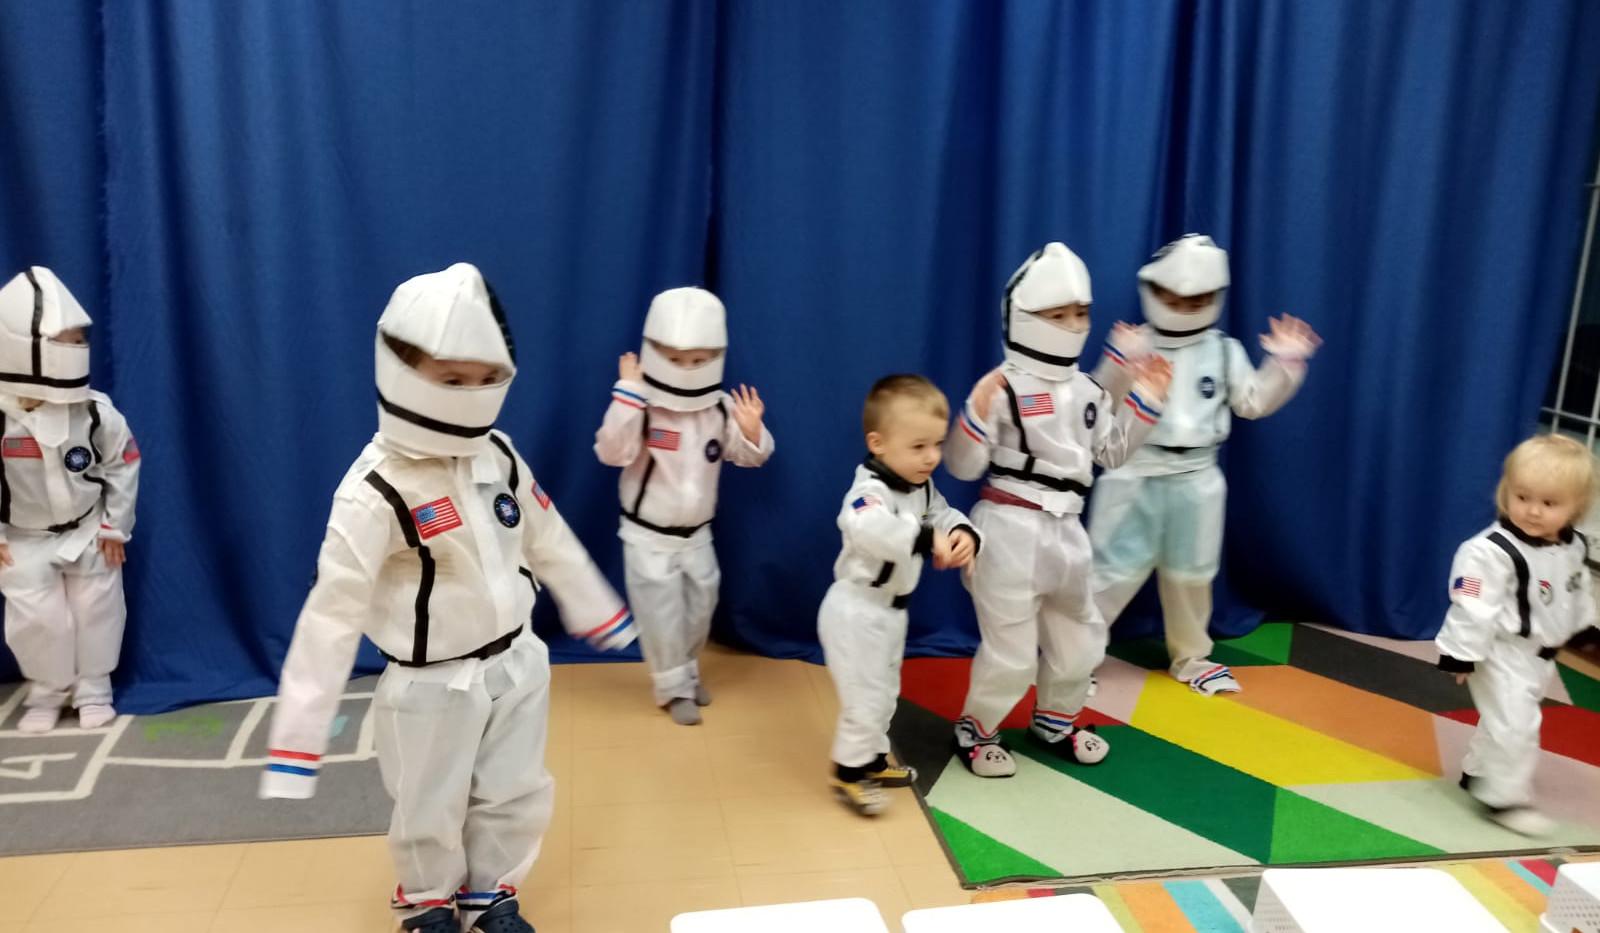 Avaruusseikkailu